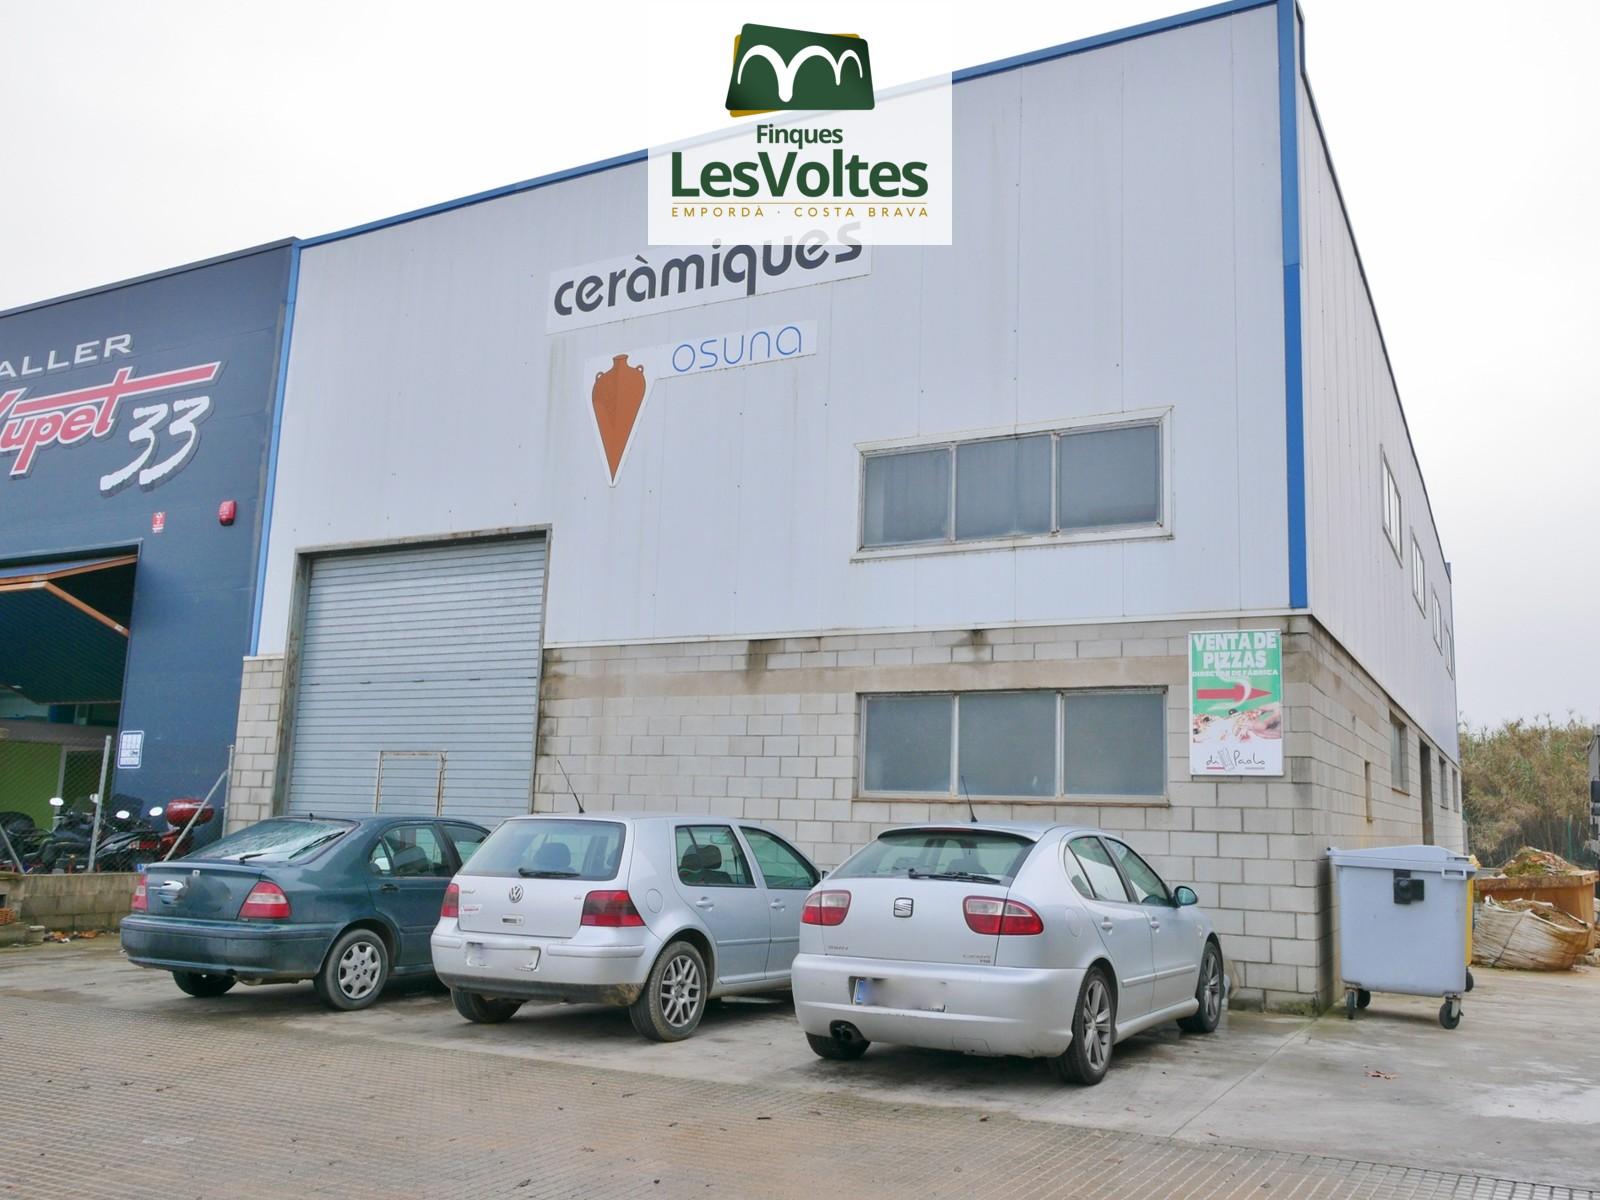 Nave Industrial en venta en La Bisbal d'Empordà de 368 m2